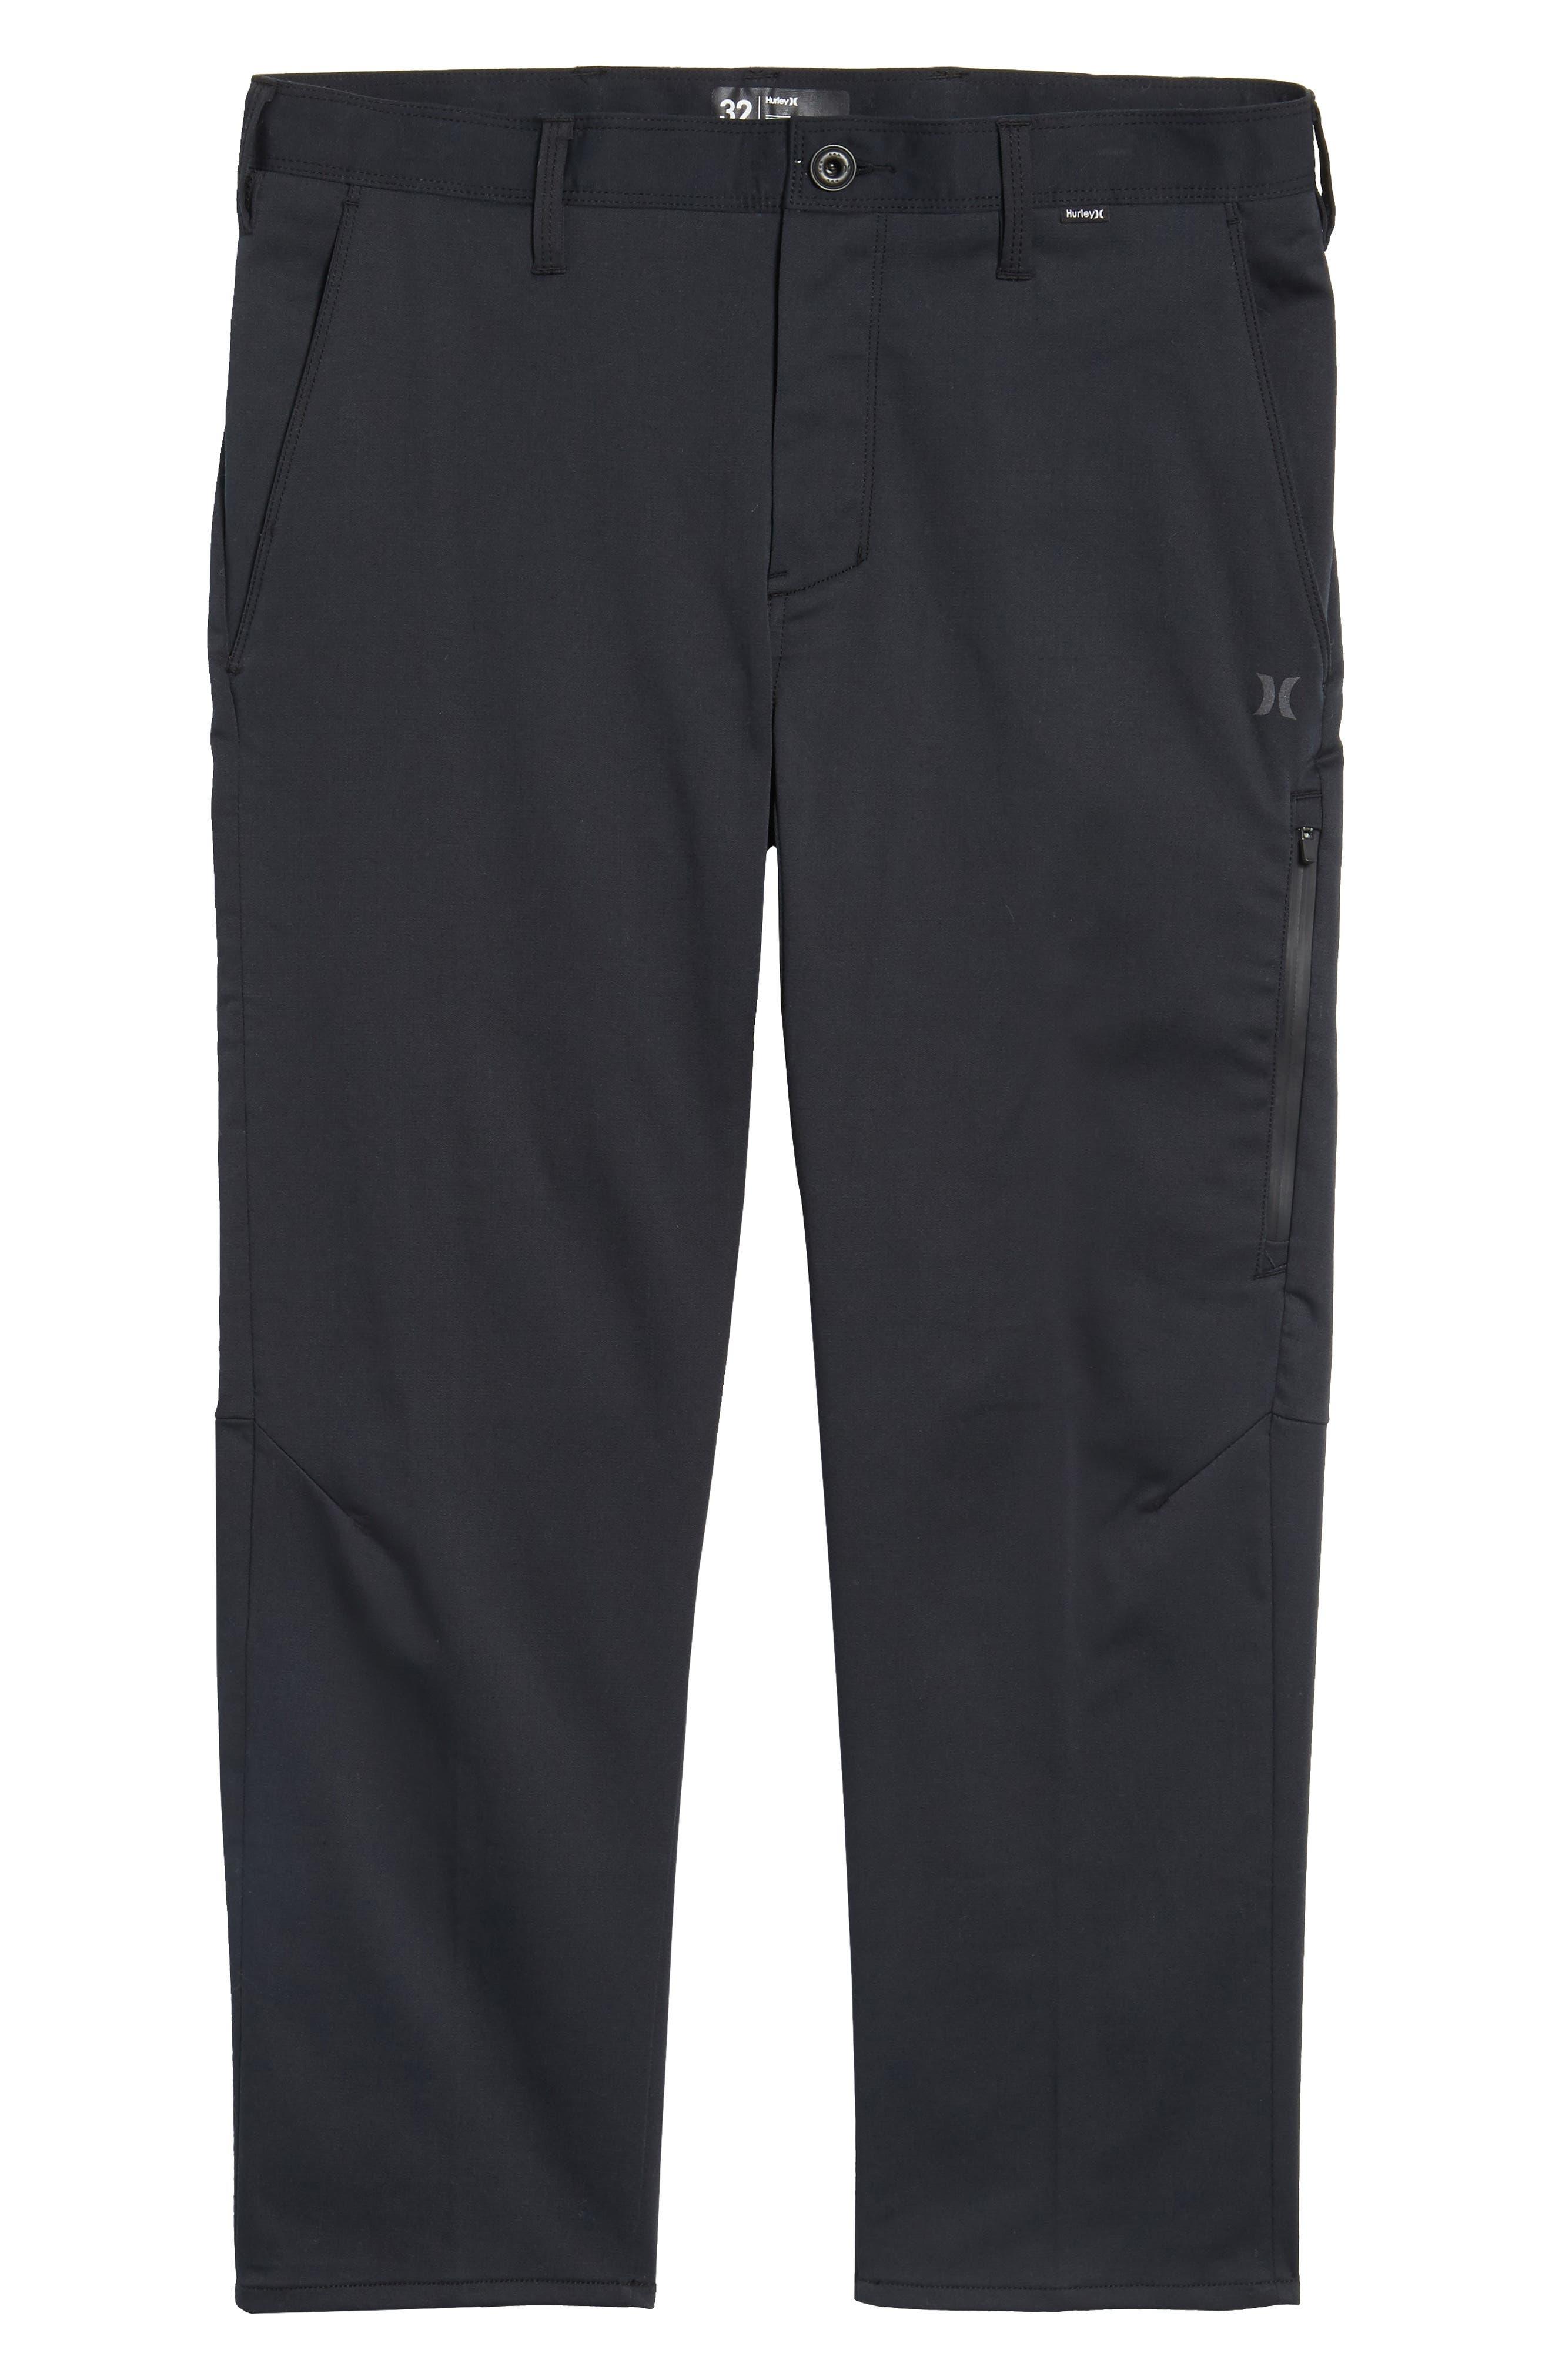 Covert Slim Fit Crop Pants,                             Alternate thumbnail 6, color,                             Black